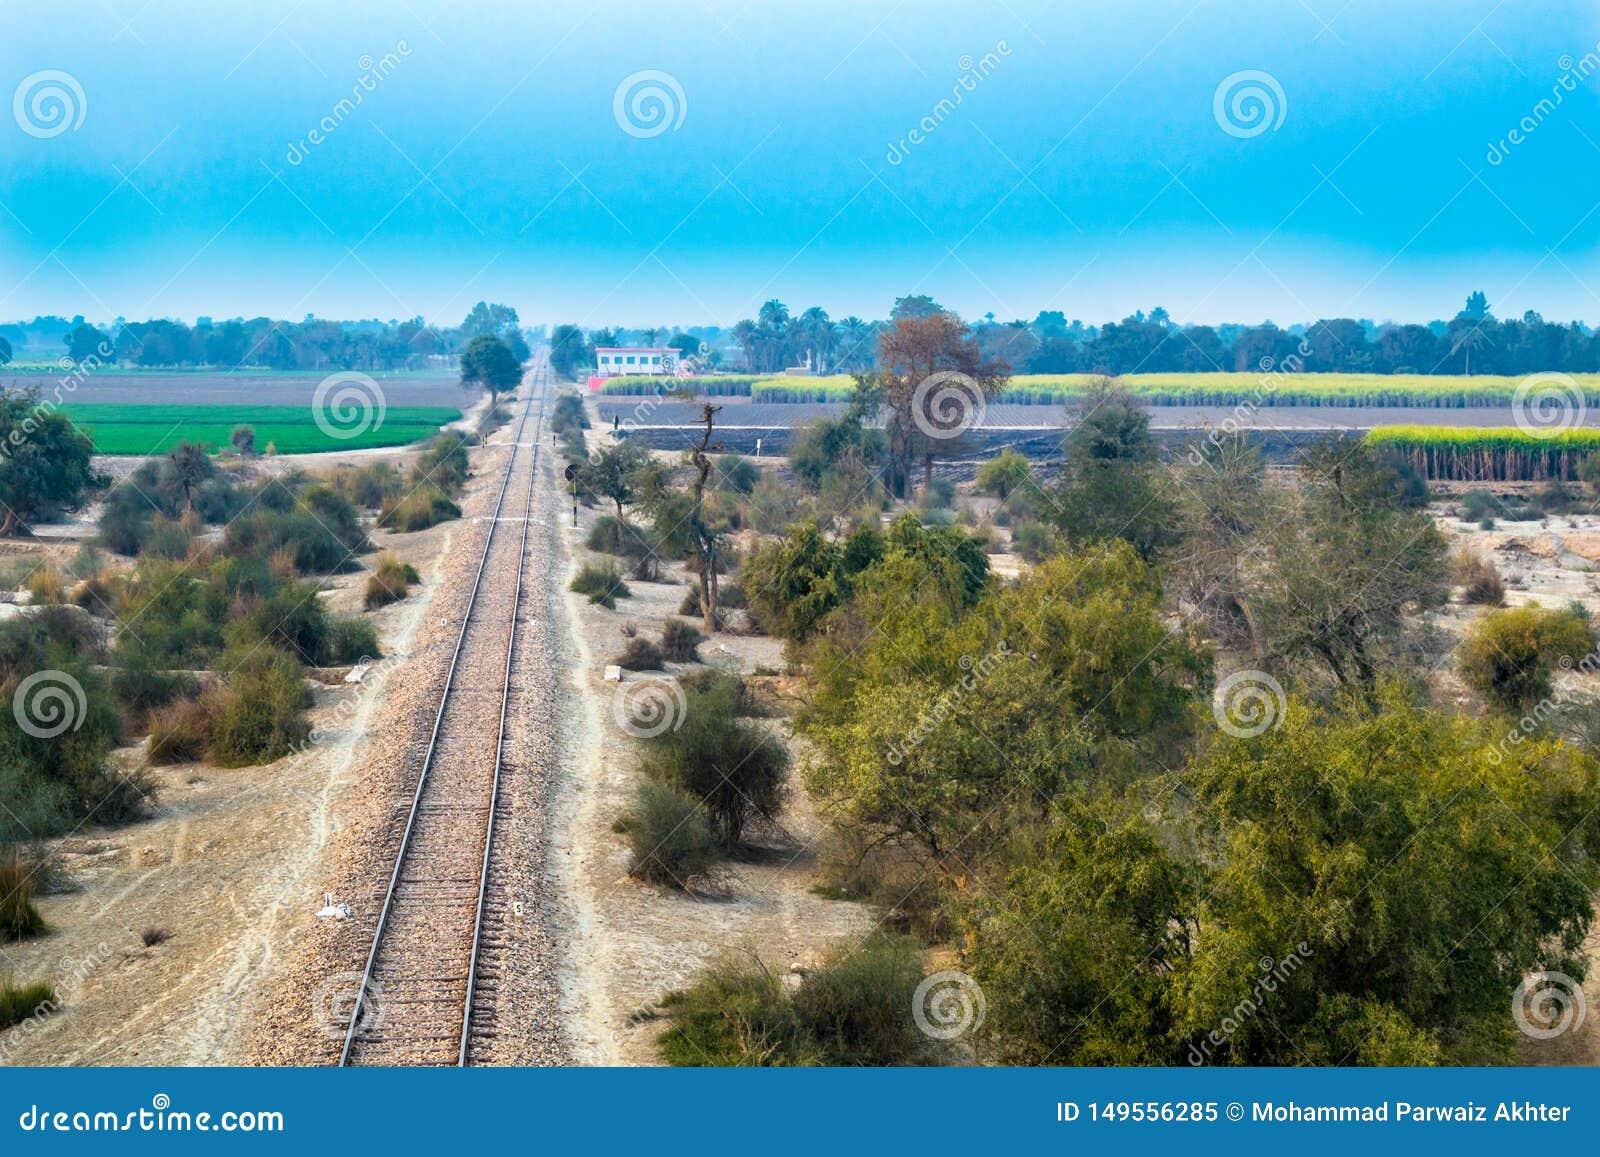 Railroad railway line in pakistan countryside